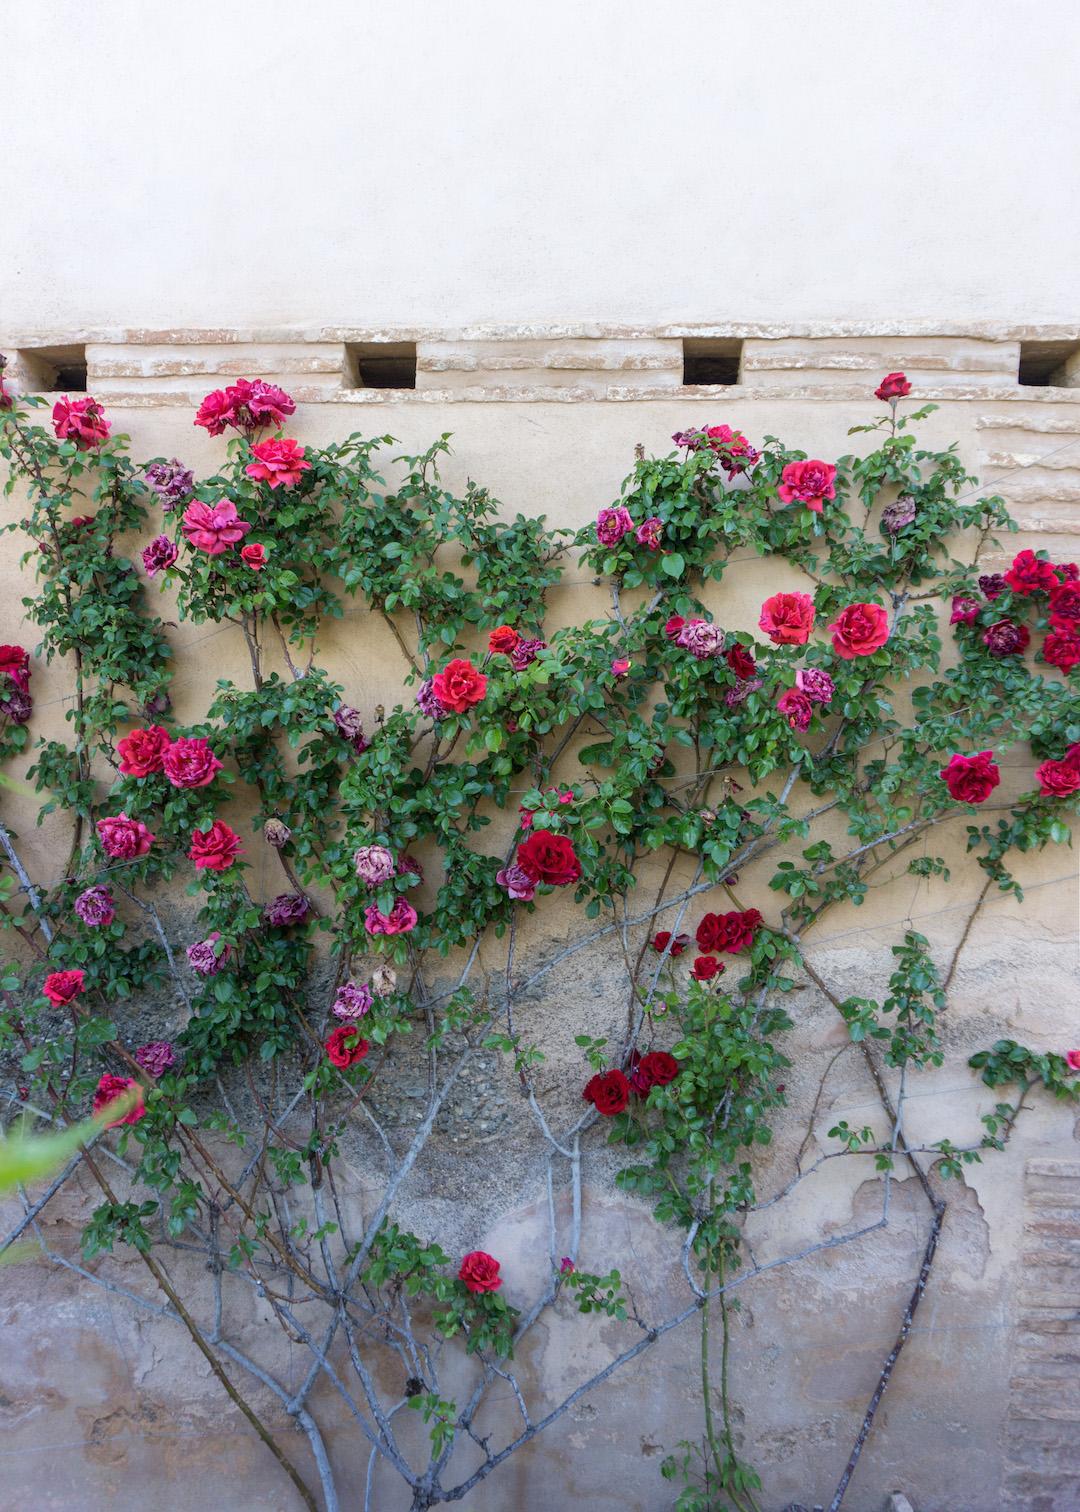 Her_Travel_Edit_Granada_Alhambra_Generalife_Garden_Roses